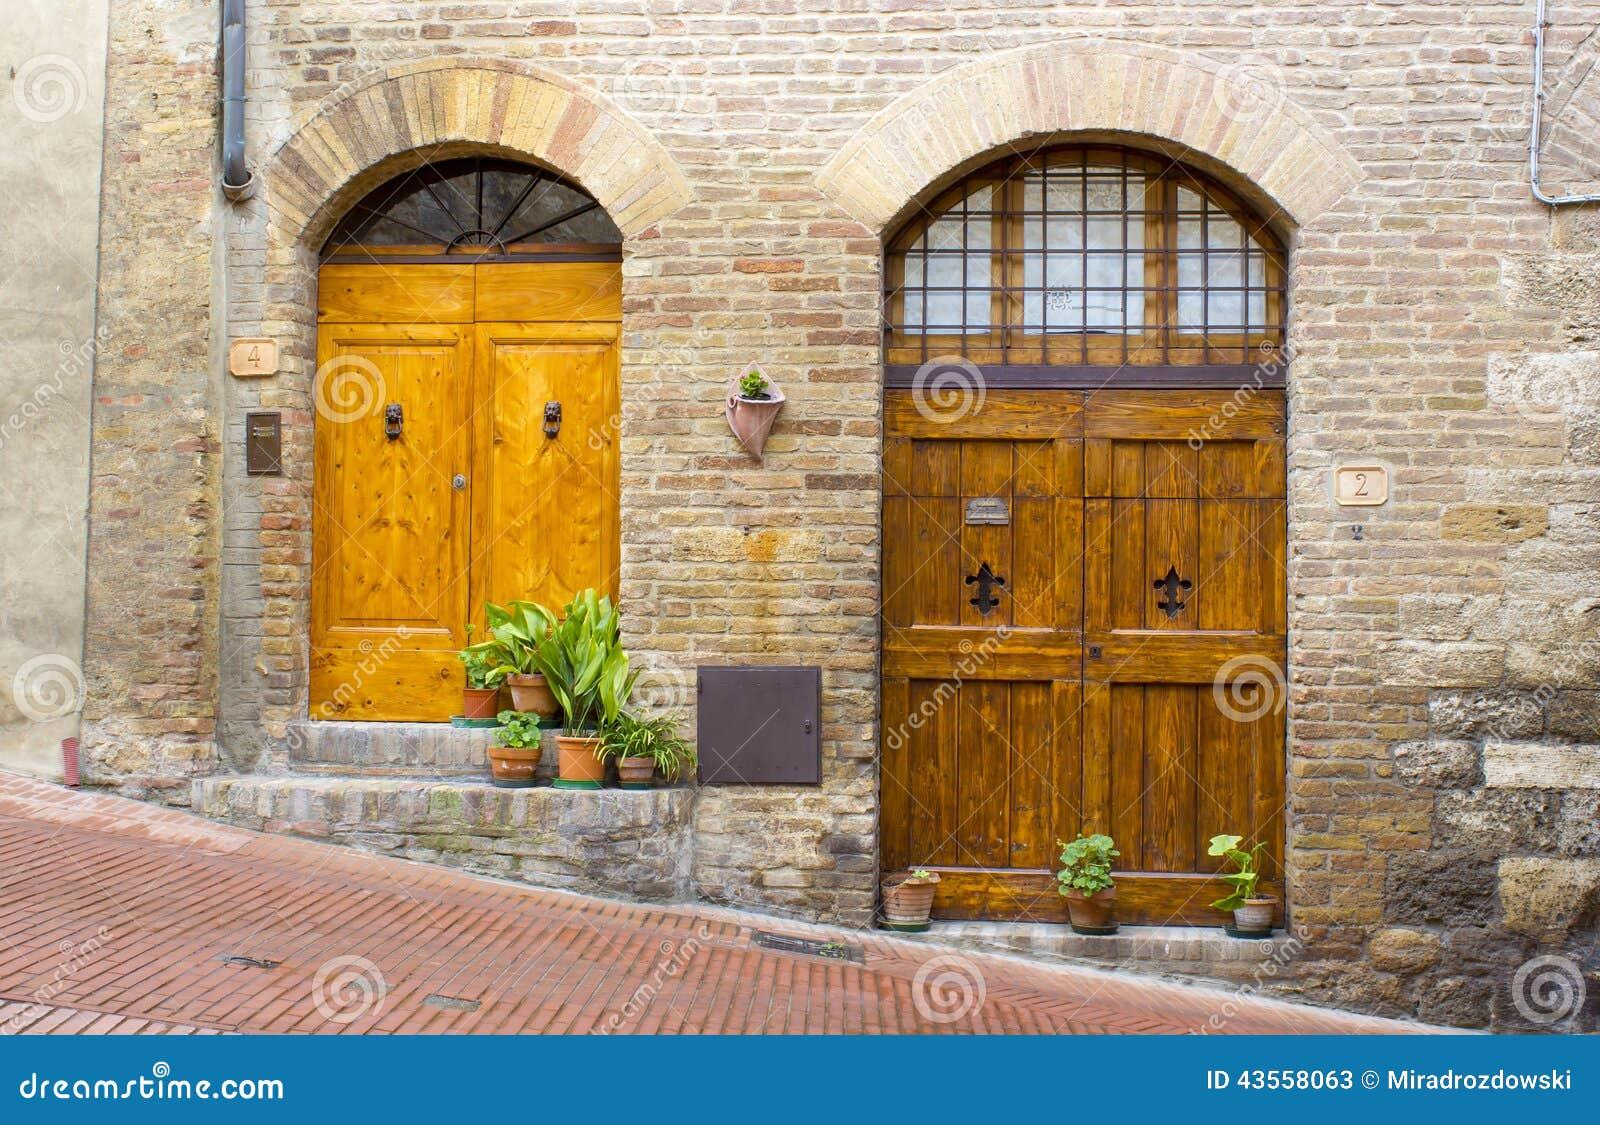 Lovely tuscan doors